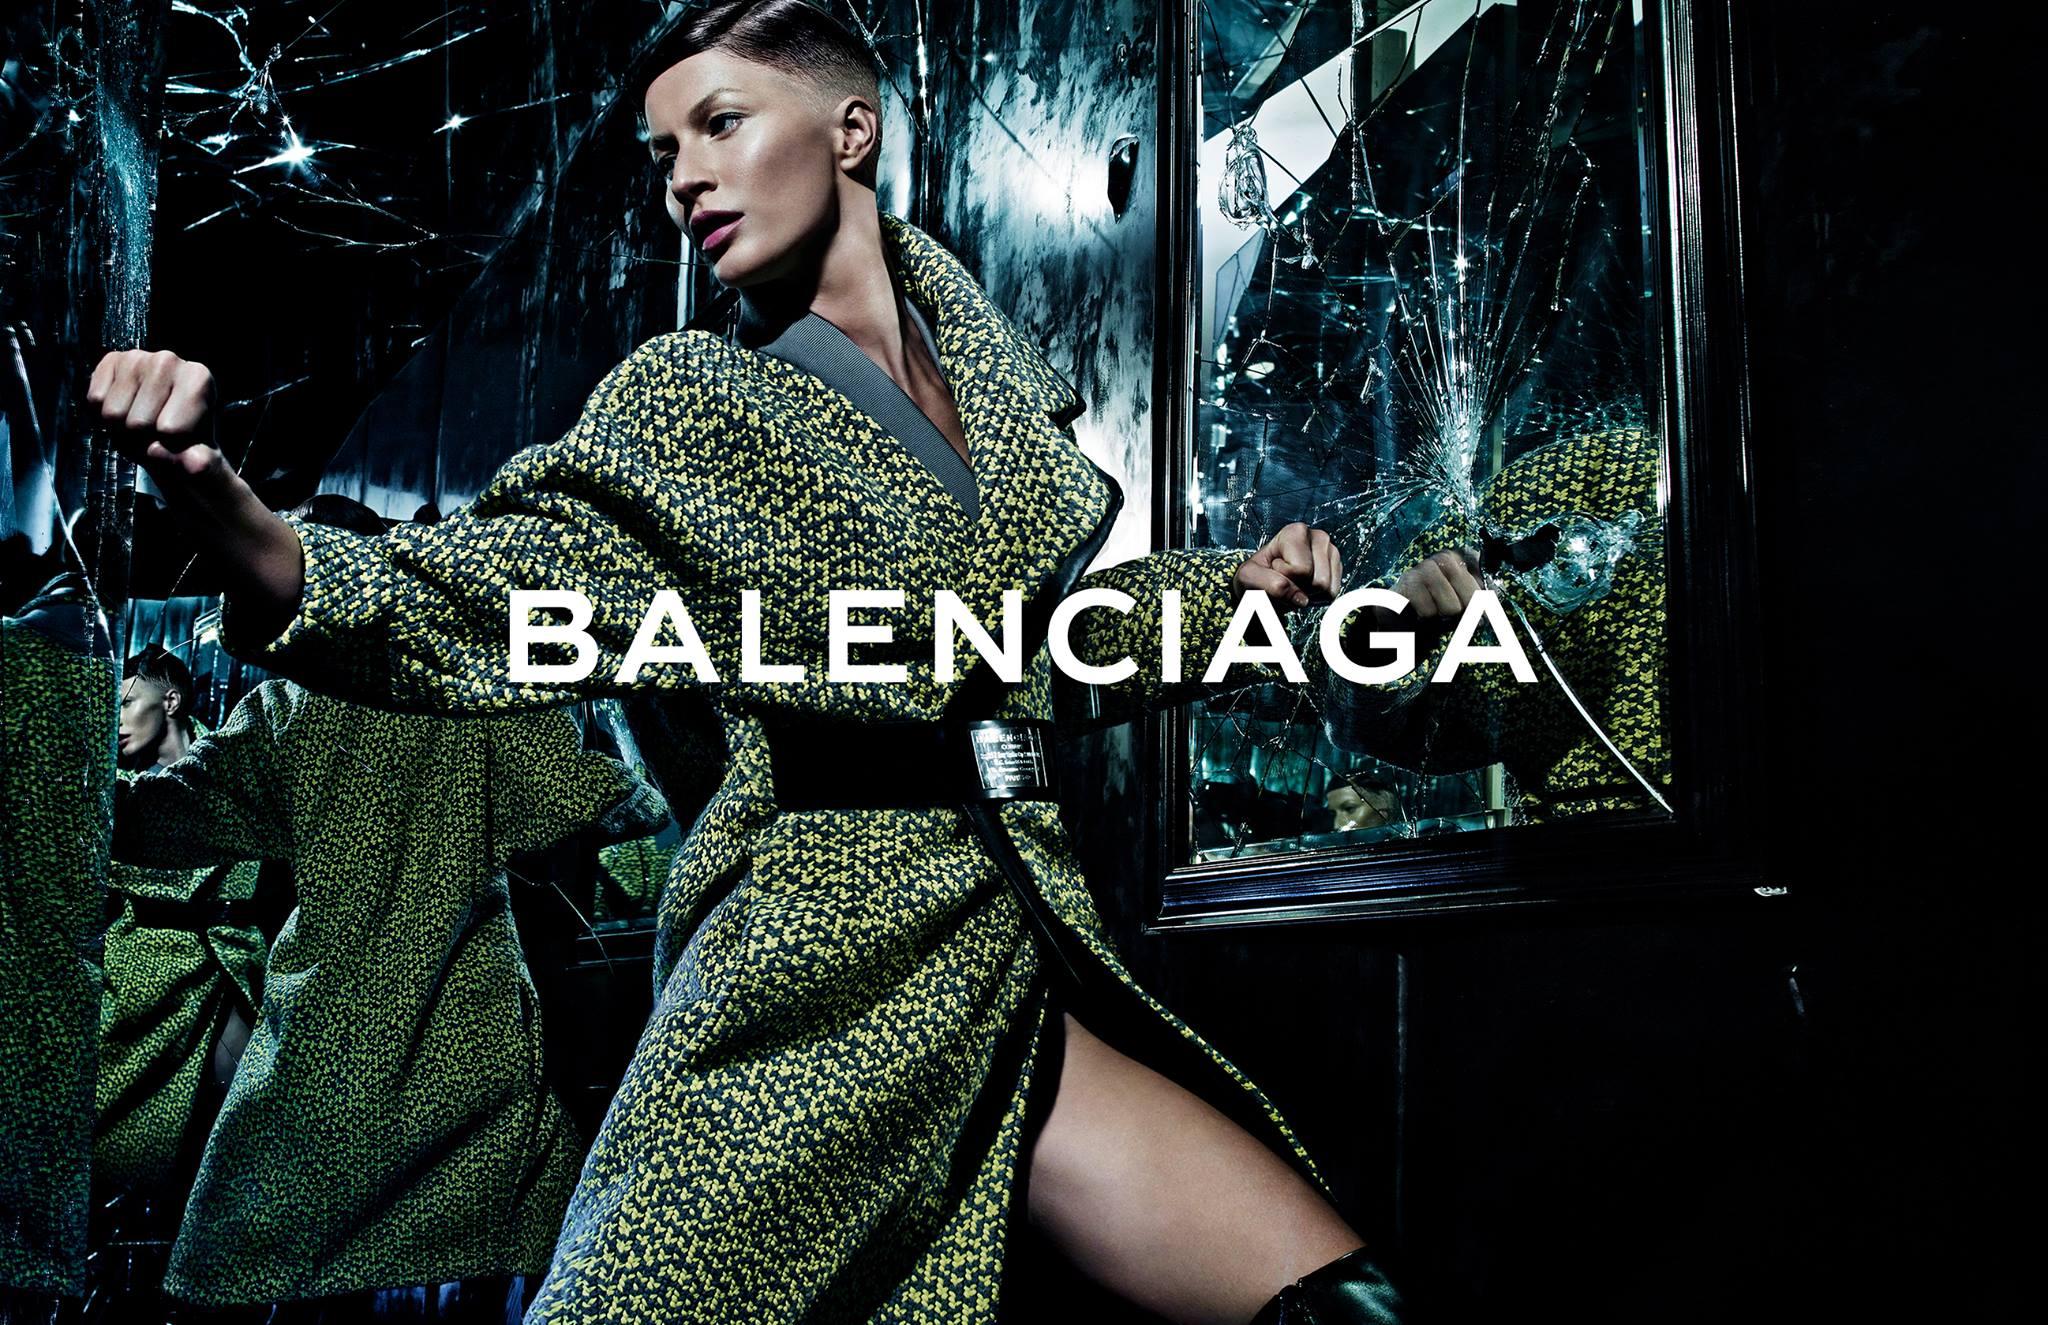 Gisele Bündchen in Balenciaga - Fall Winter 2014-2015 Campaign photographed ny Steven Klein